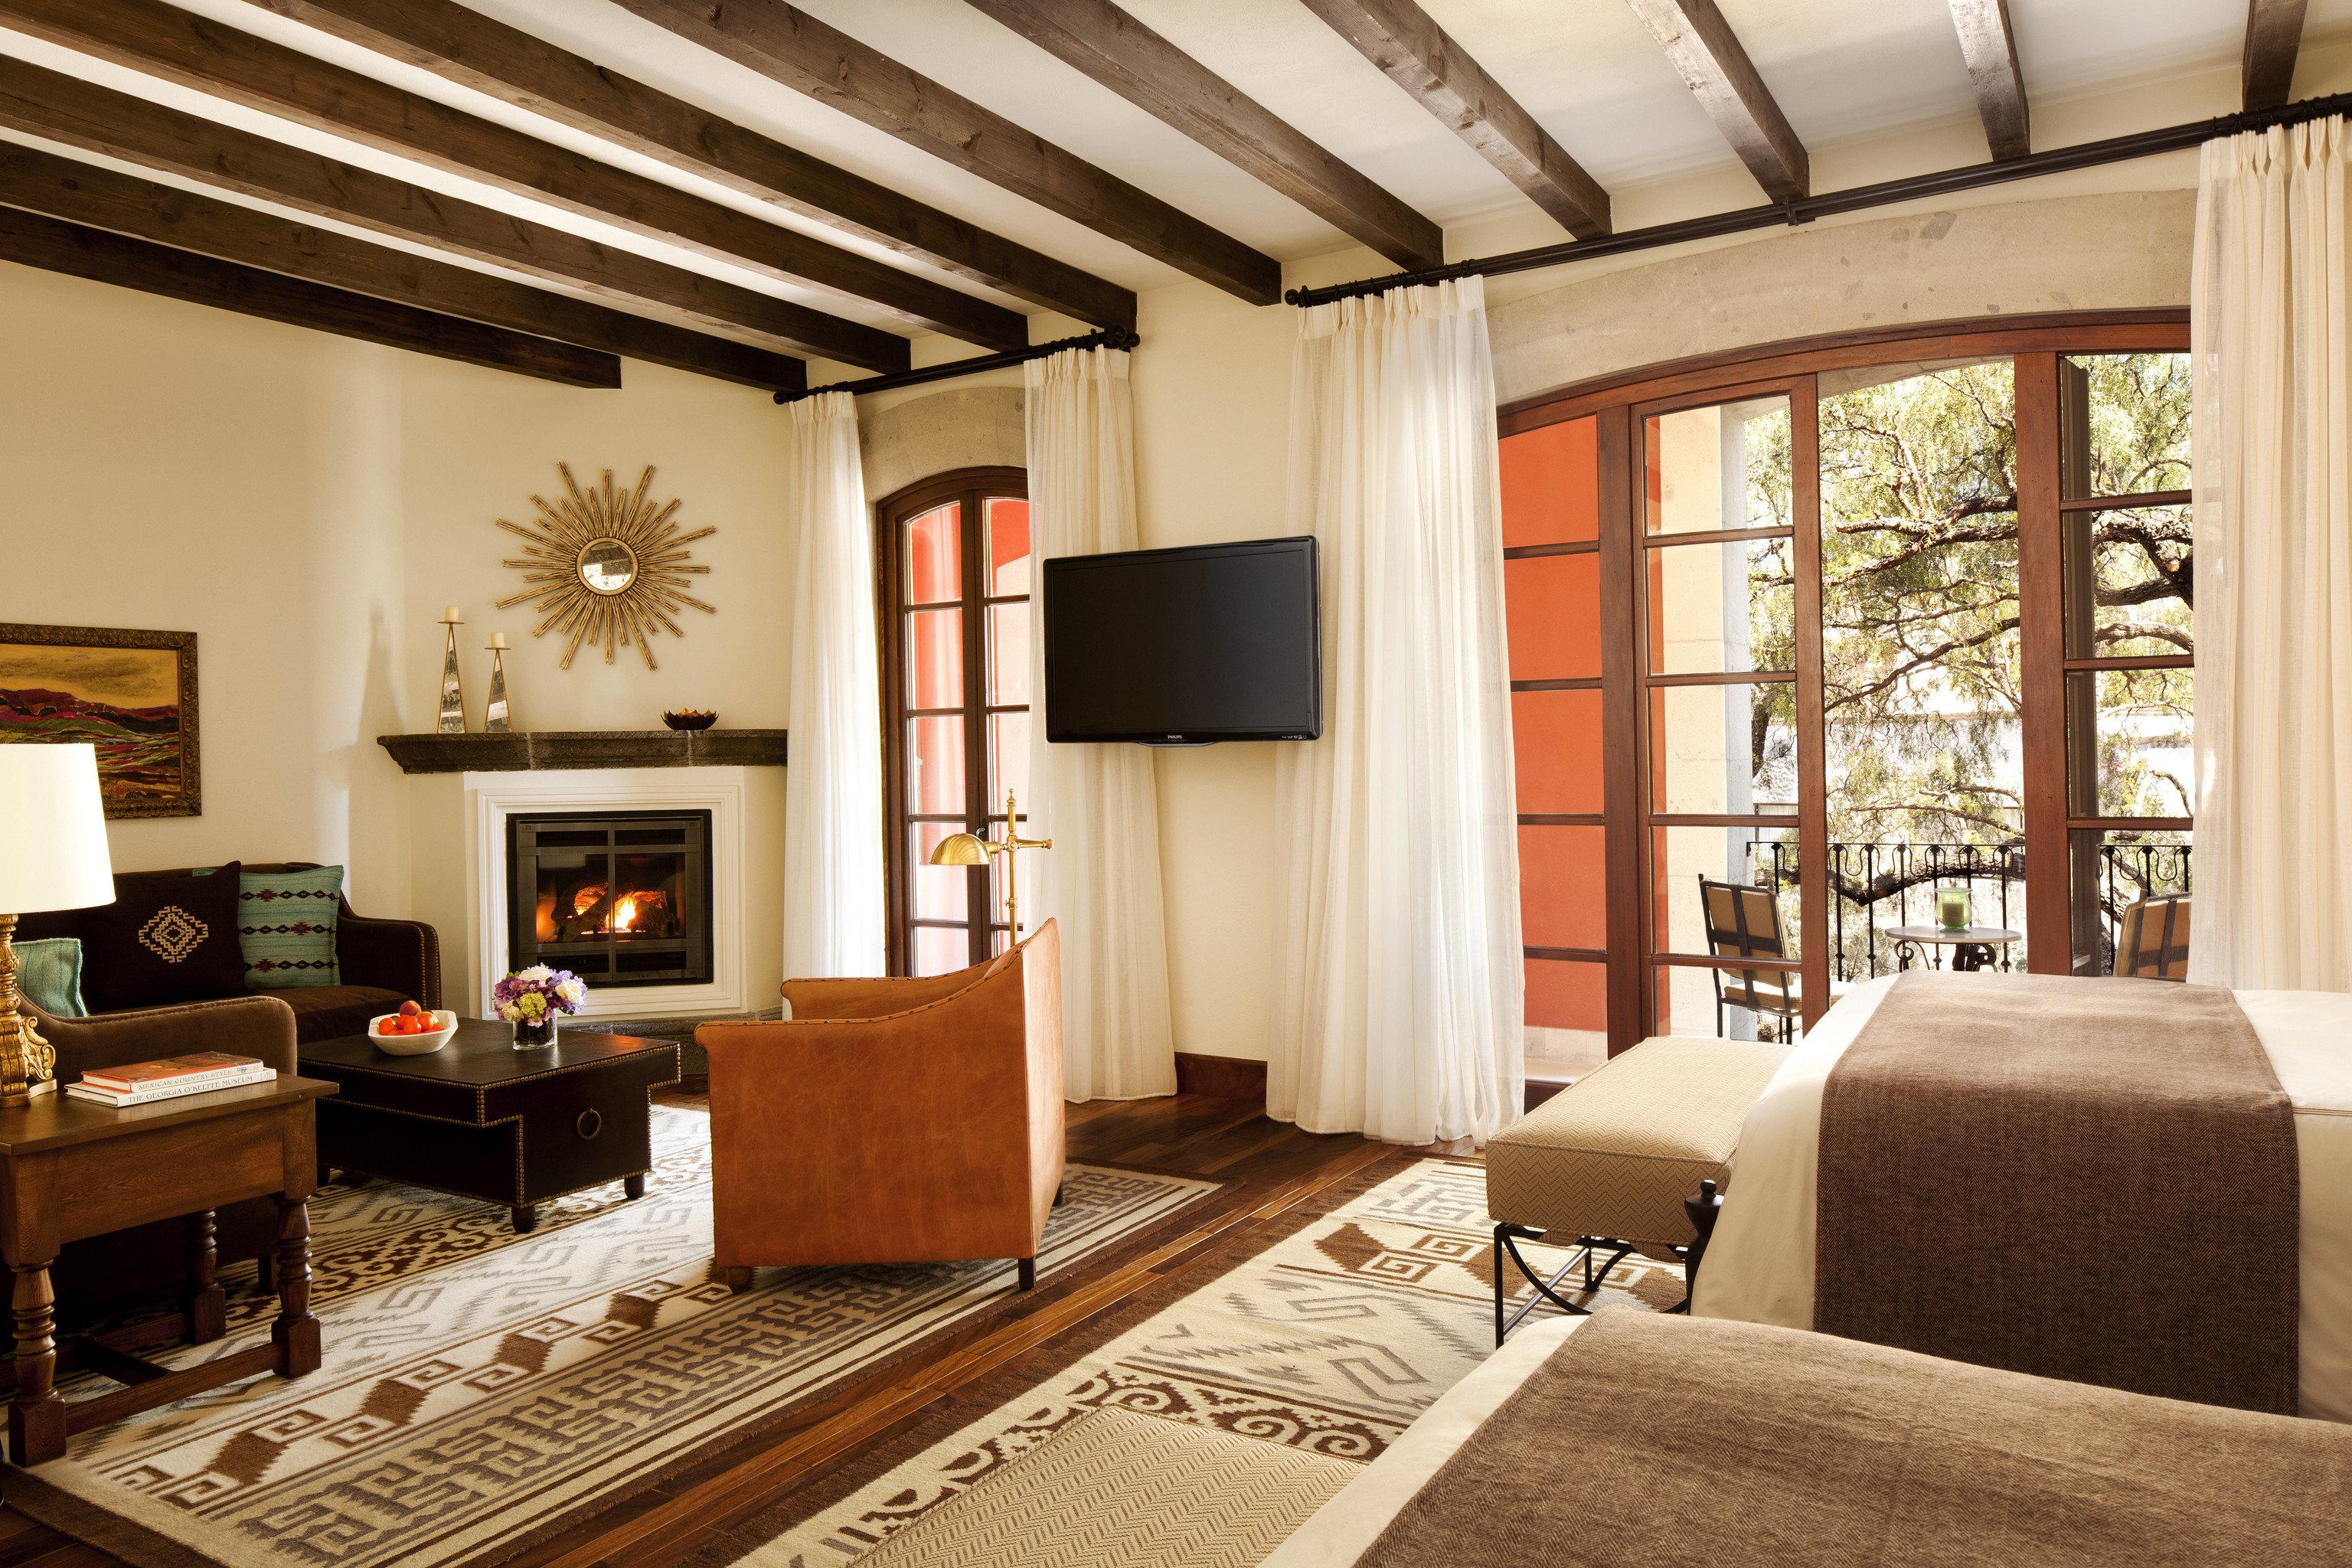 sofa property living room home Suite cottage Villa farmhouse mansion Bedroom flat